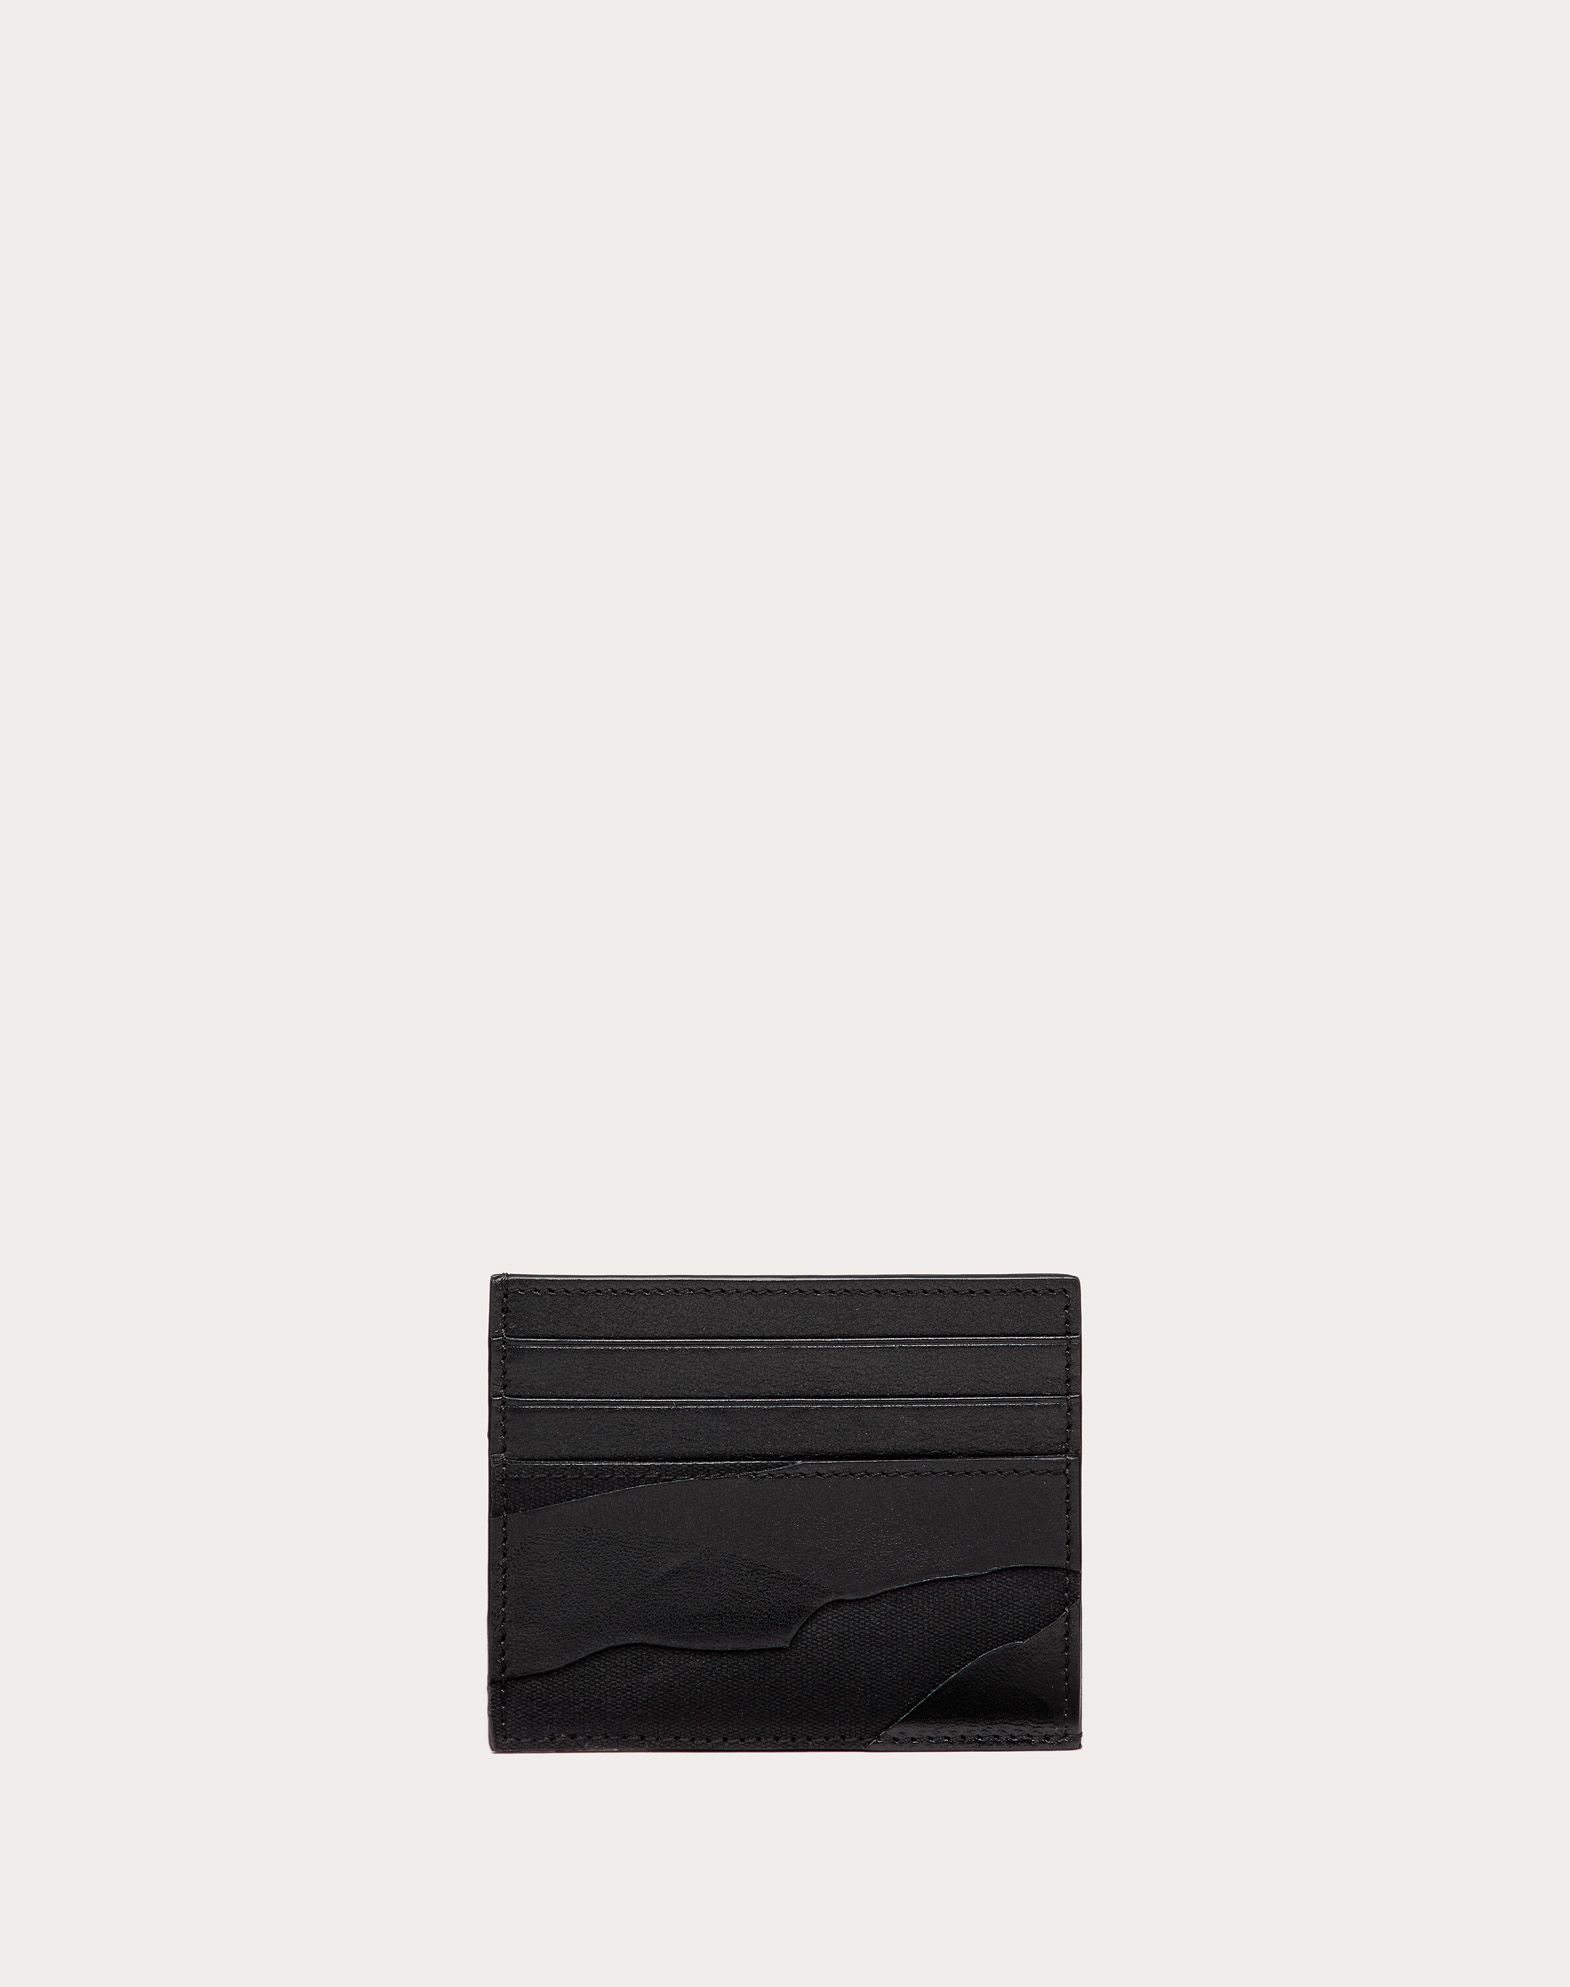 VALENTINO GARAVANI UOMO Camouflage Noir Cardholder  COIN PURSES & CARD CASES U f